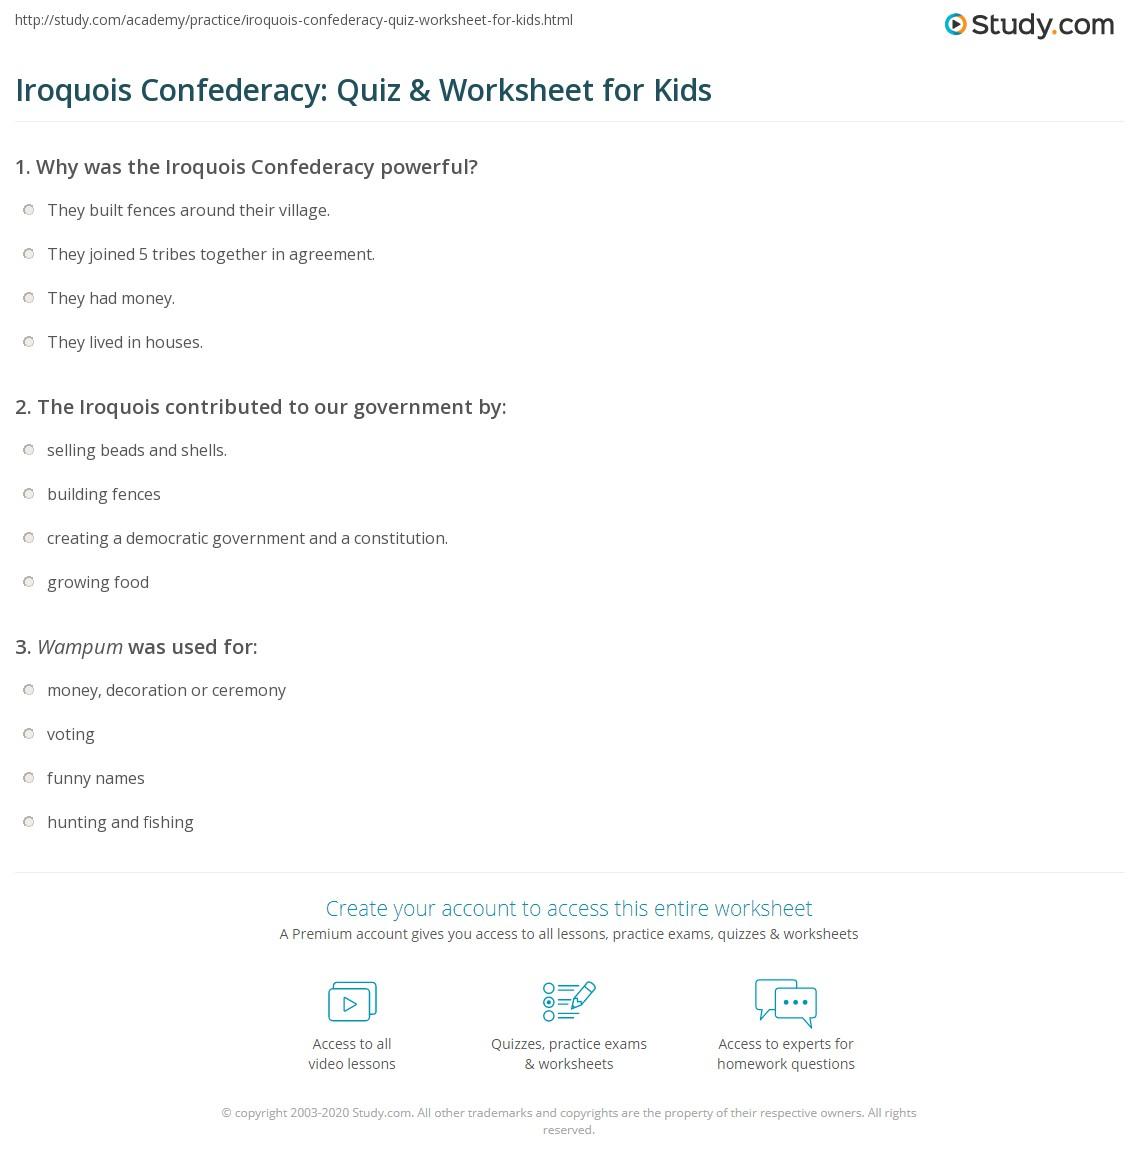 Iroquois Confederacy: Quiz & Worksheet for Kids | Study com